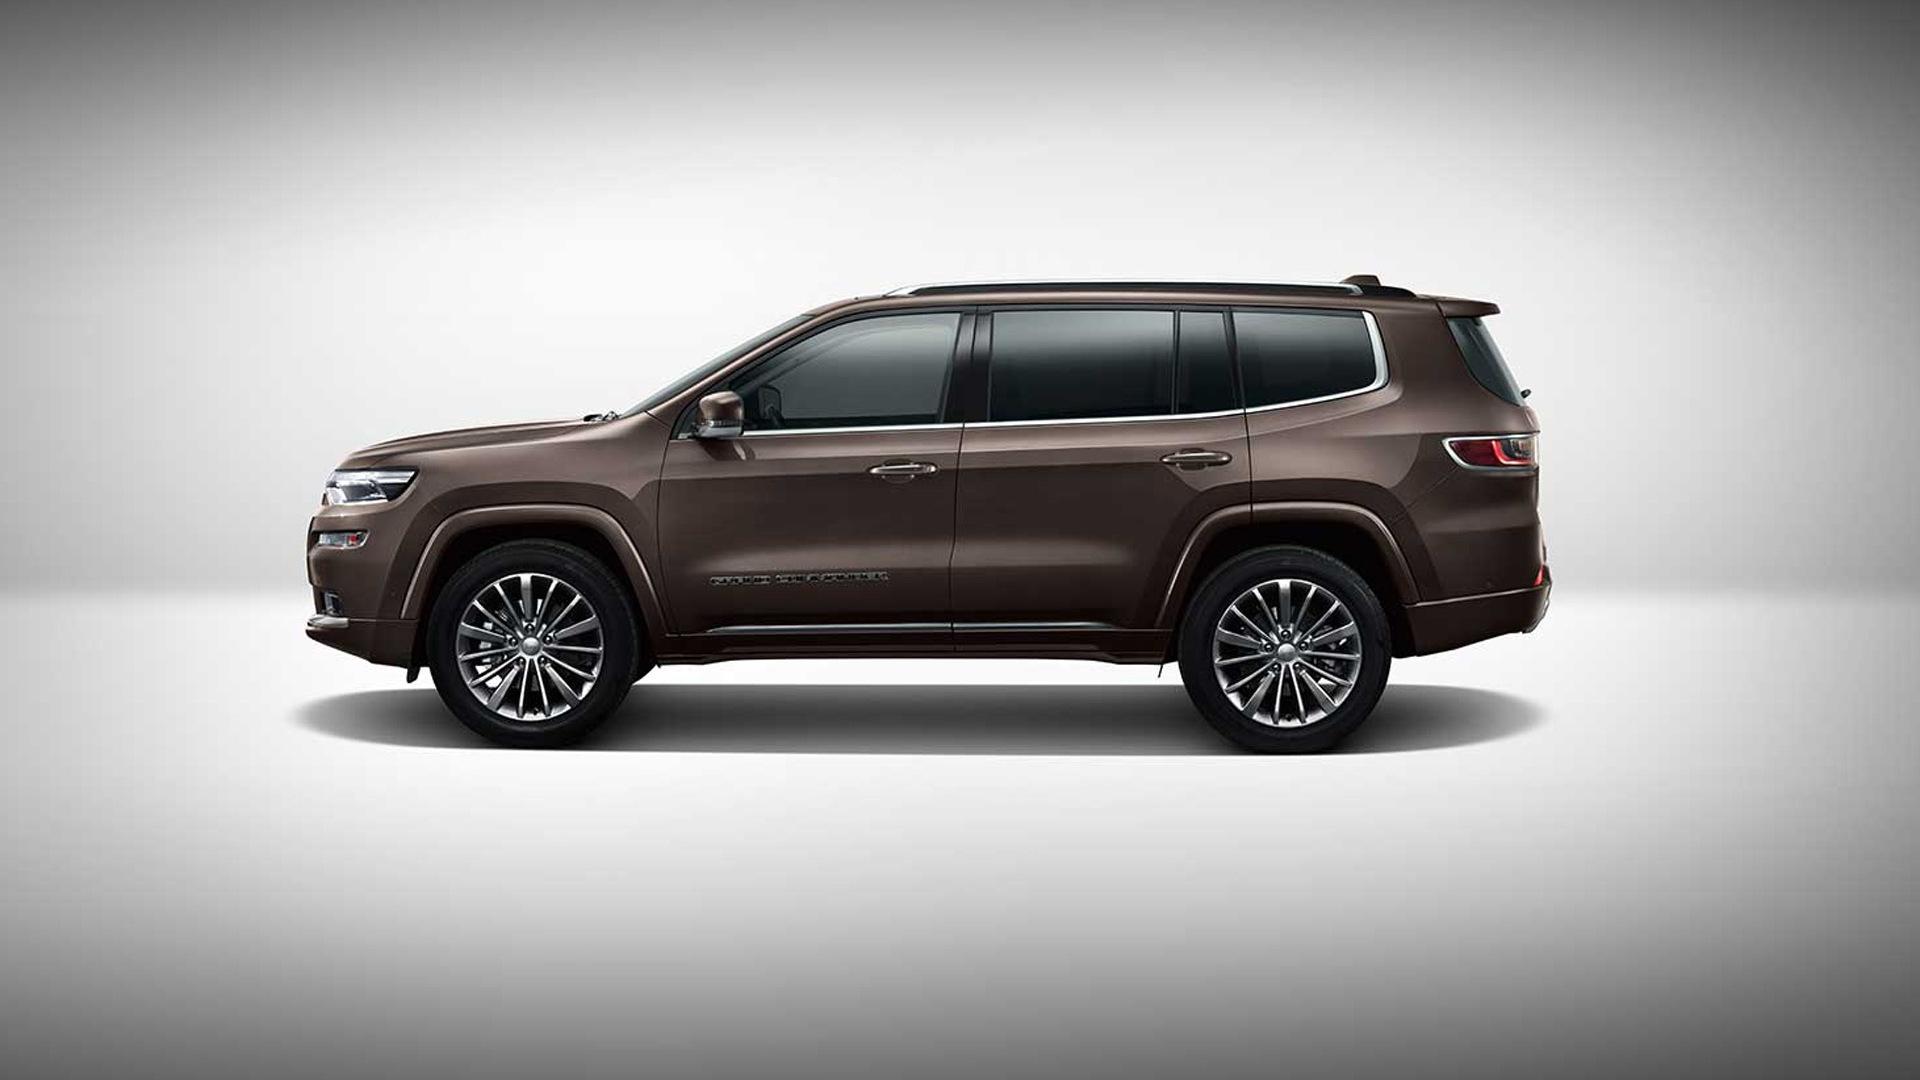 jeep grand commander debuts at 2018 beijing auto show. Black Bedroom Furniture Sets. Home Design Ideas